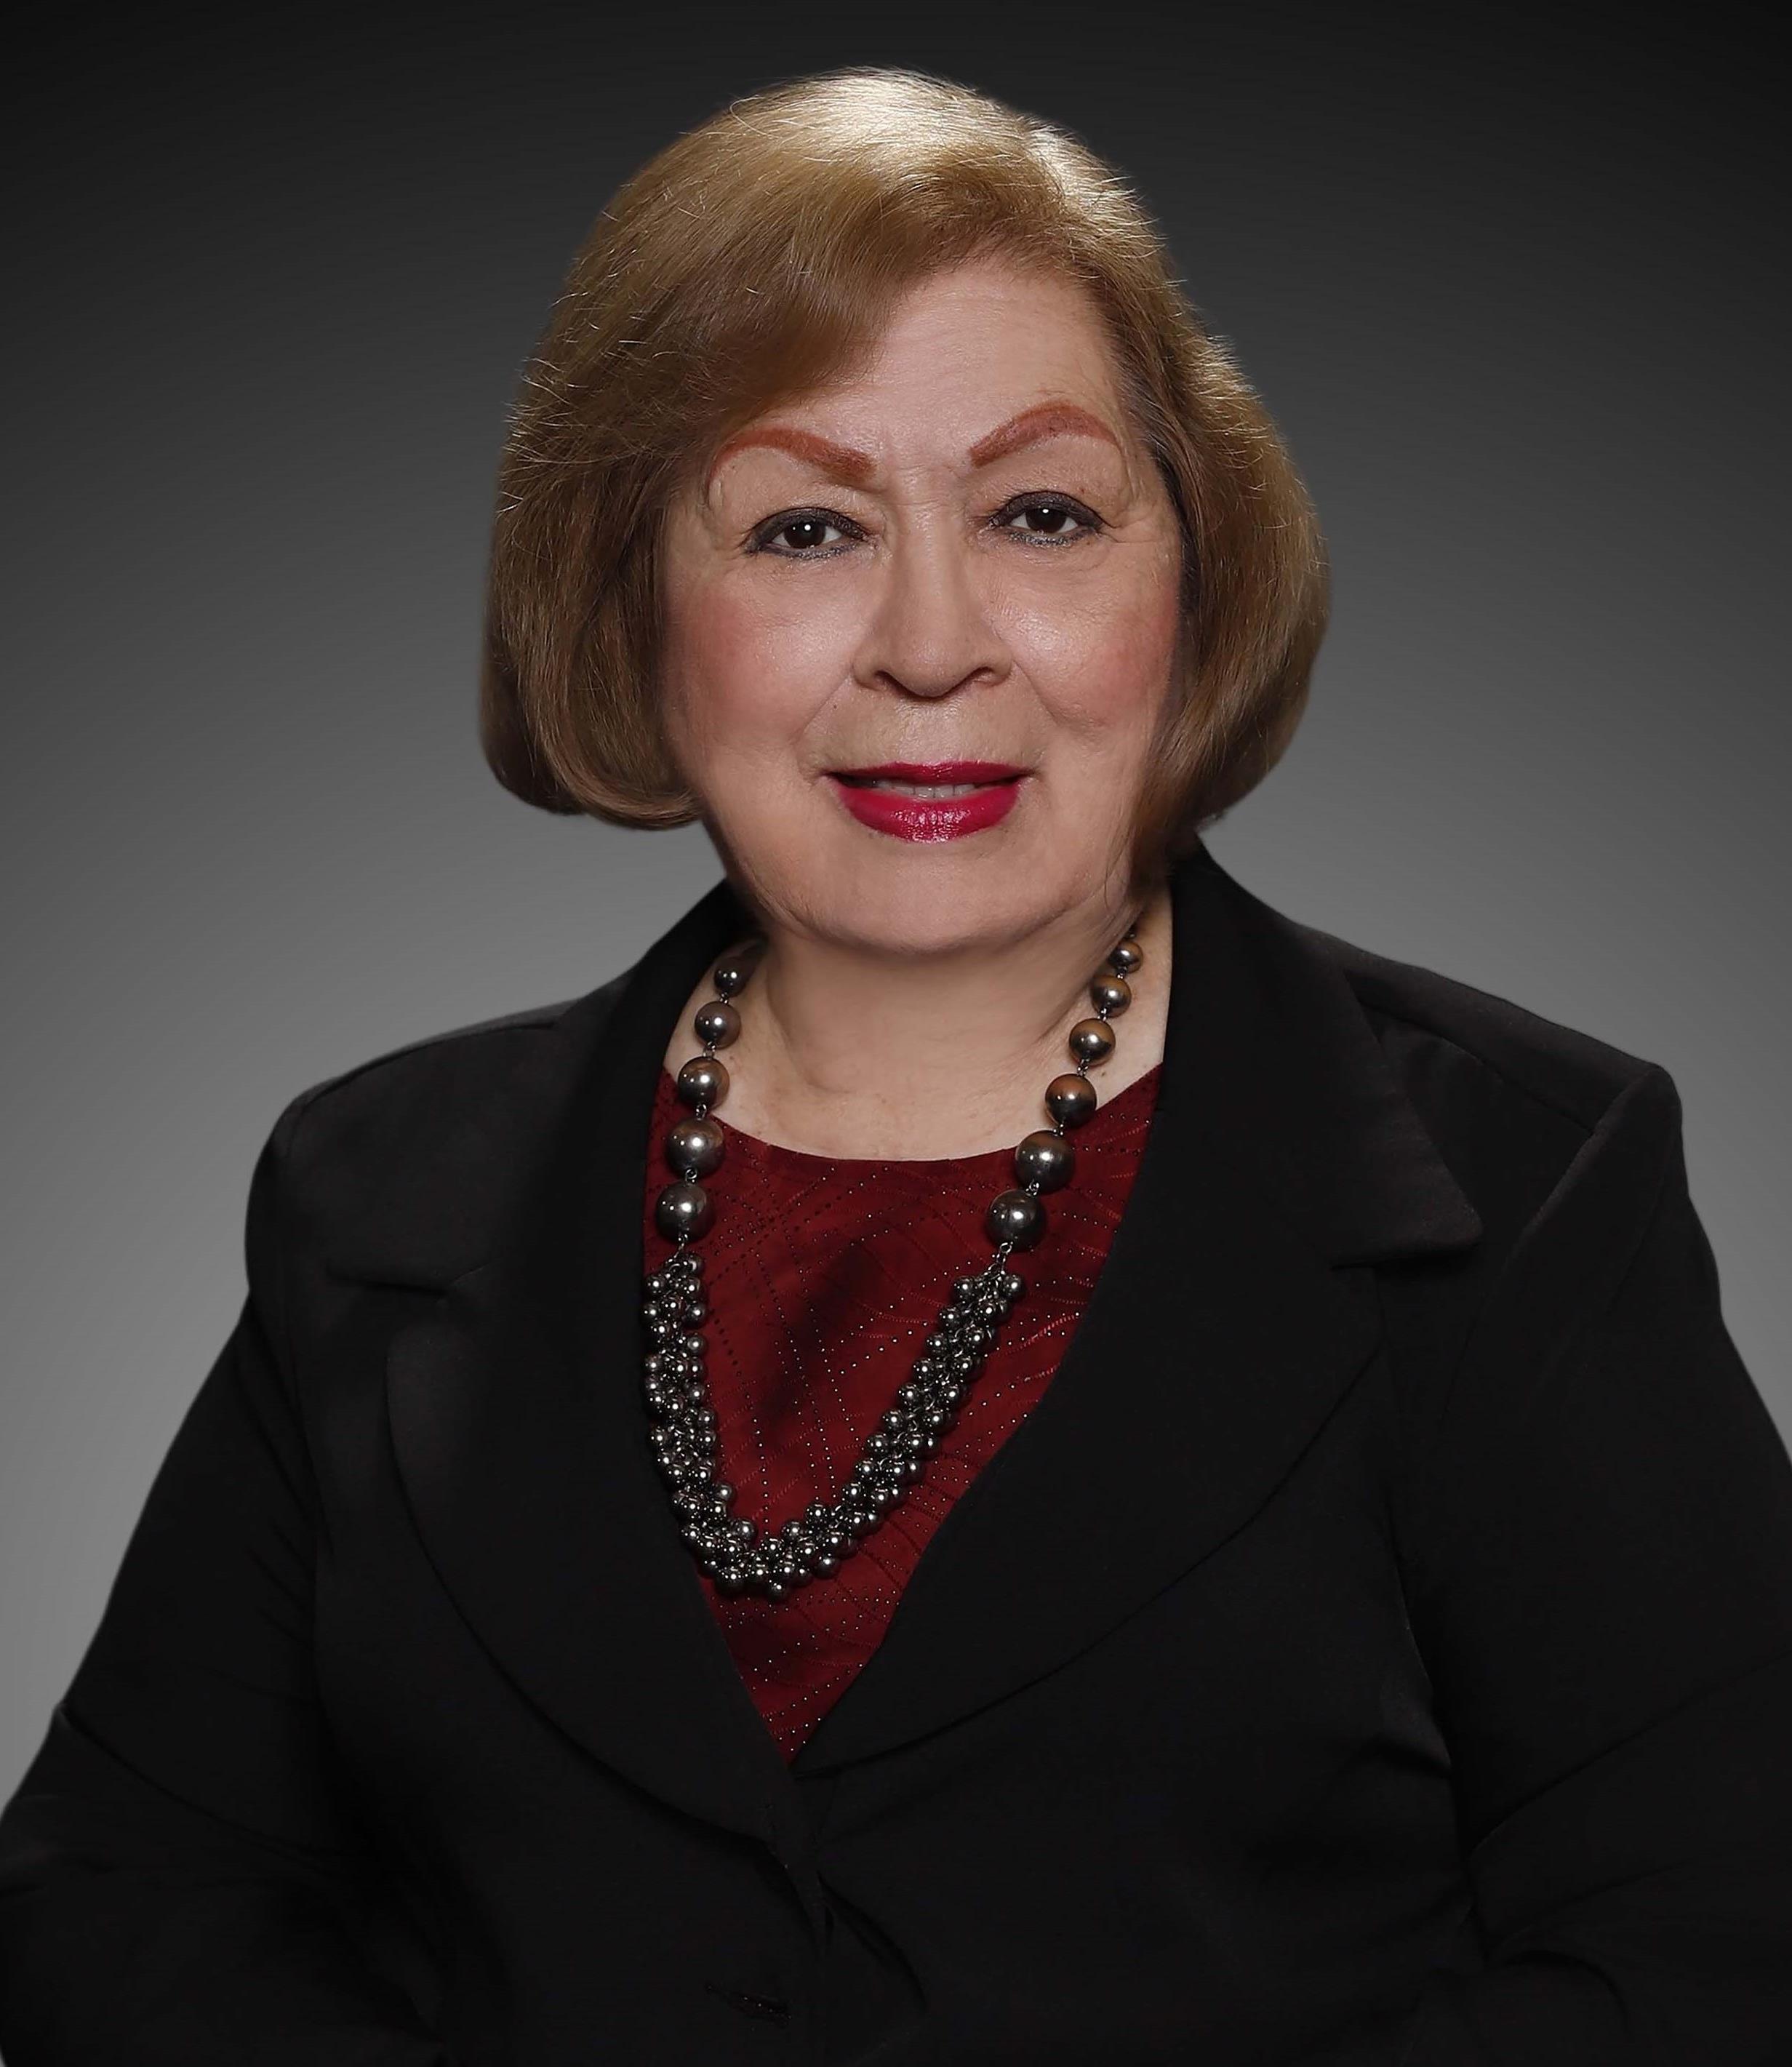 GloriaGallego